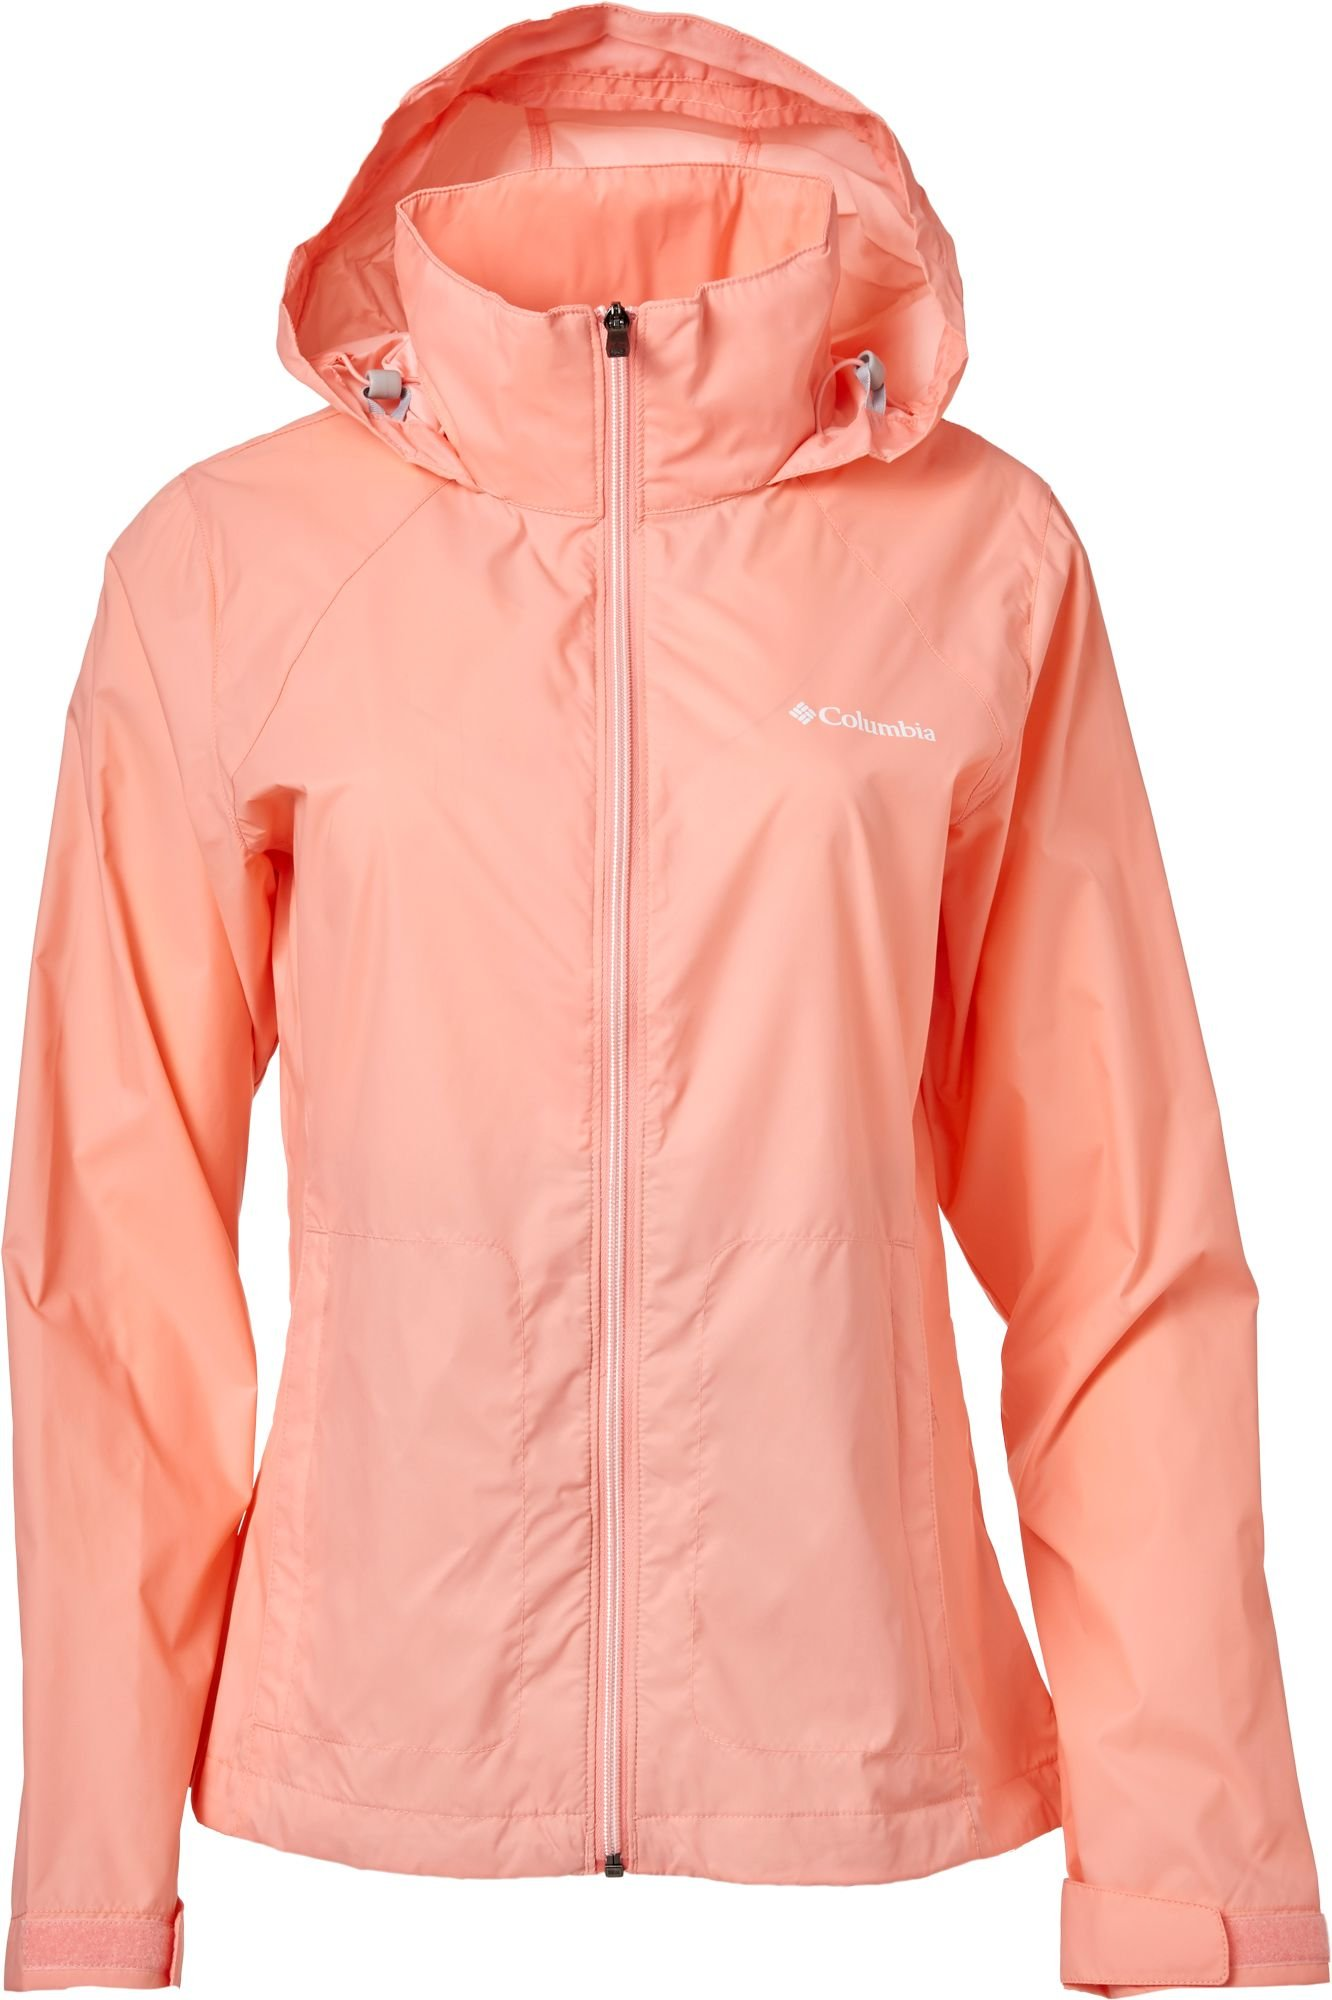 Columbia Women's Switchback Rain Jacket (Sorbet, Small) by Columbia